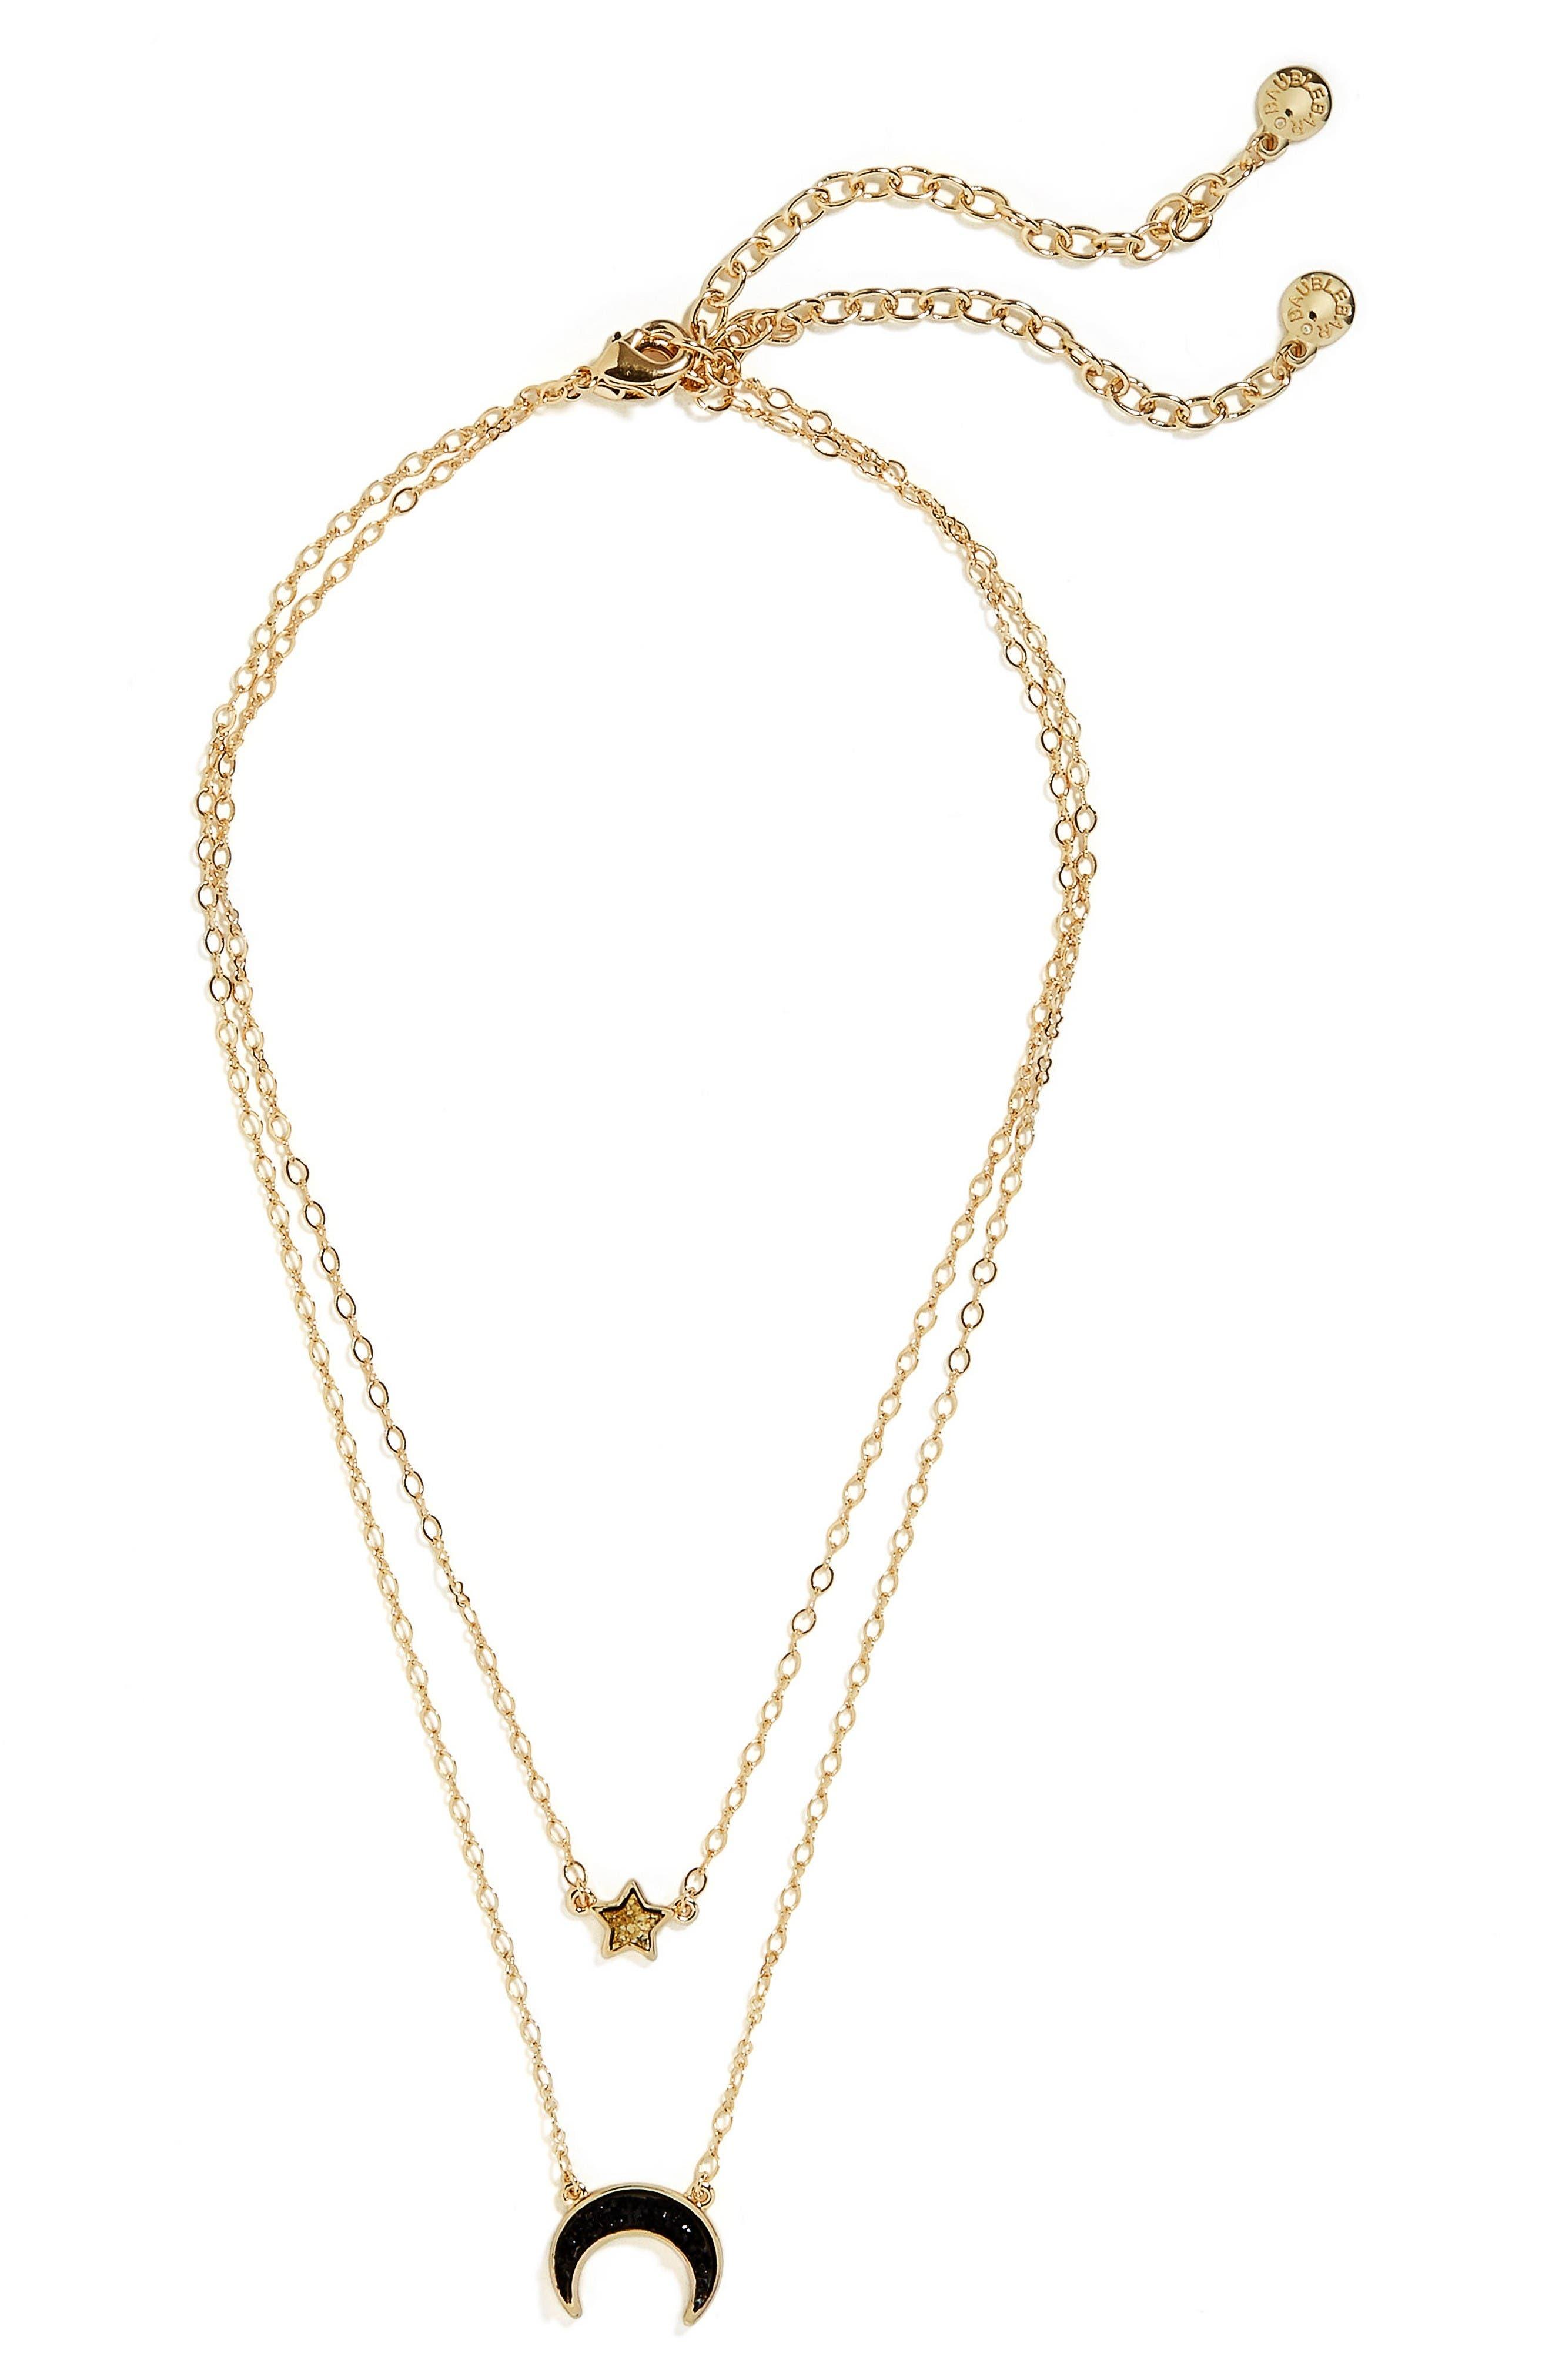 Main Image - BaubleBar Skye Layered Necklace